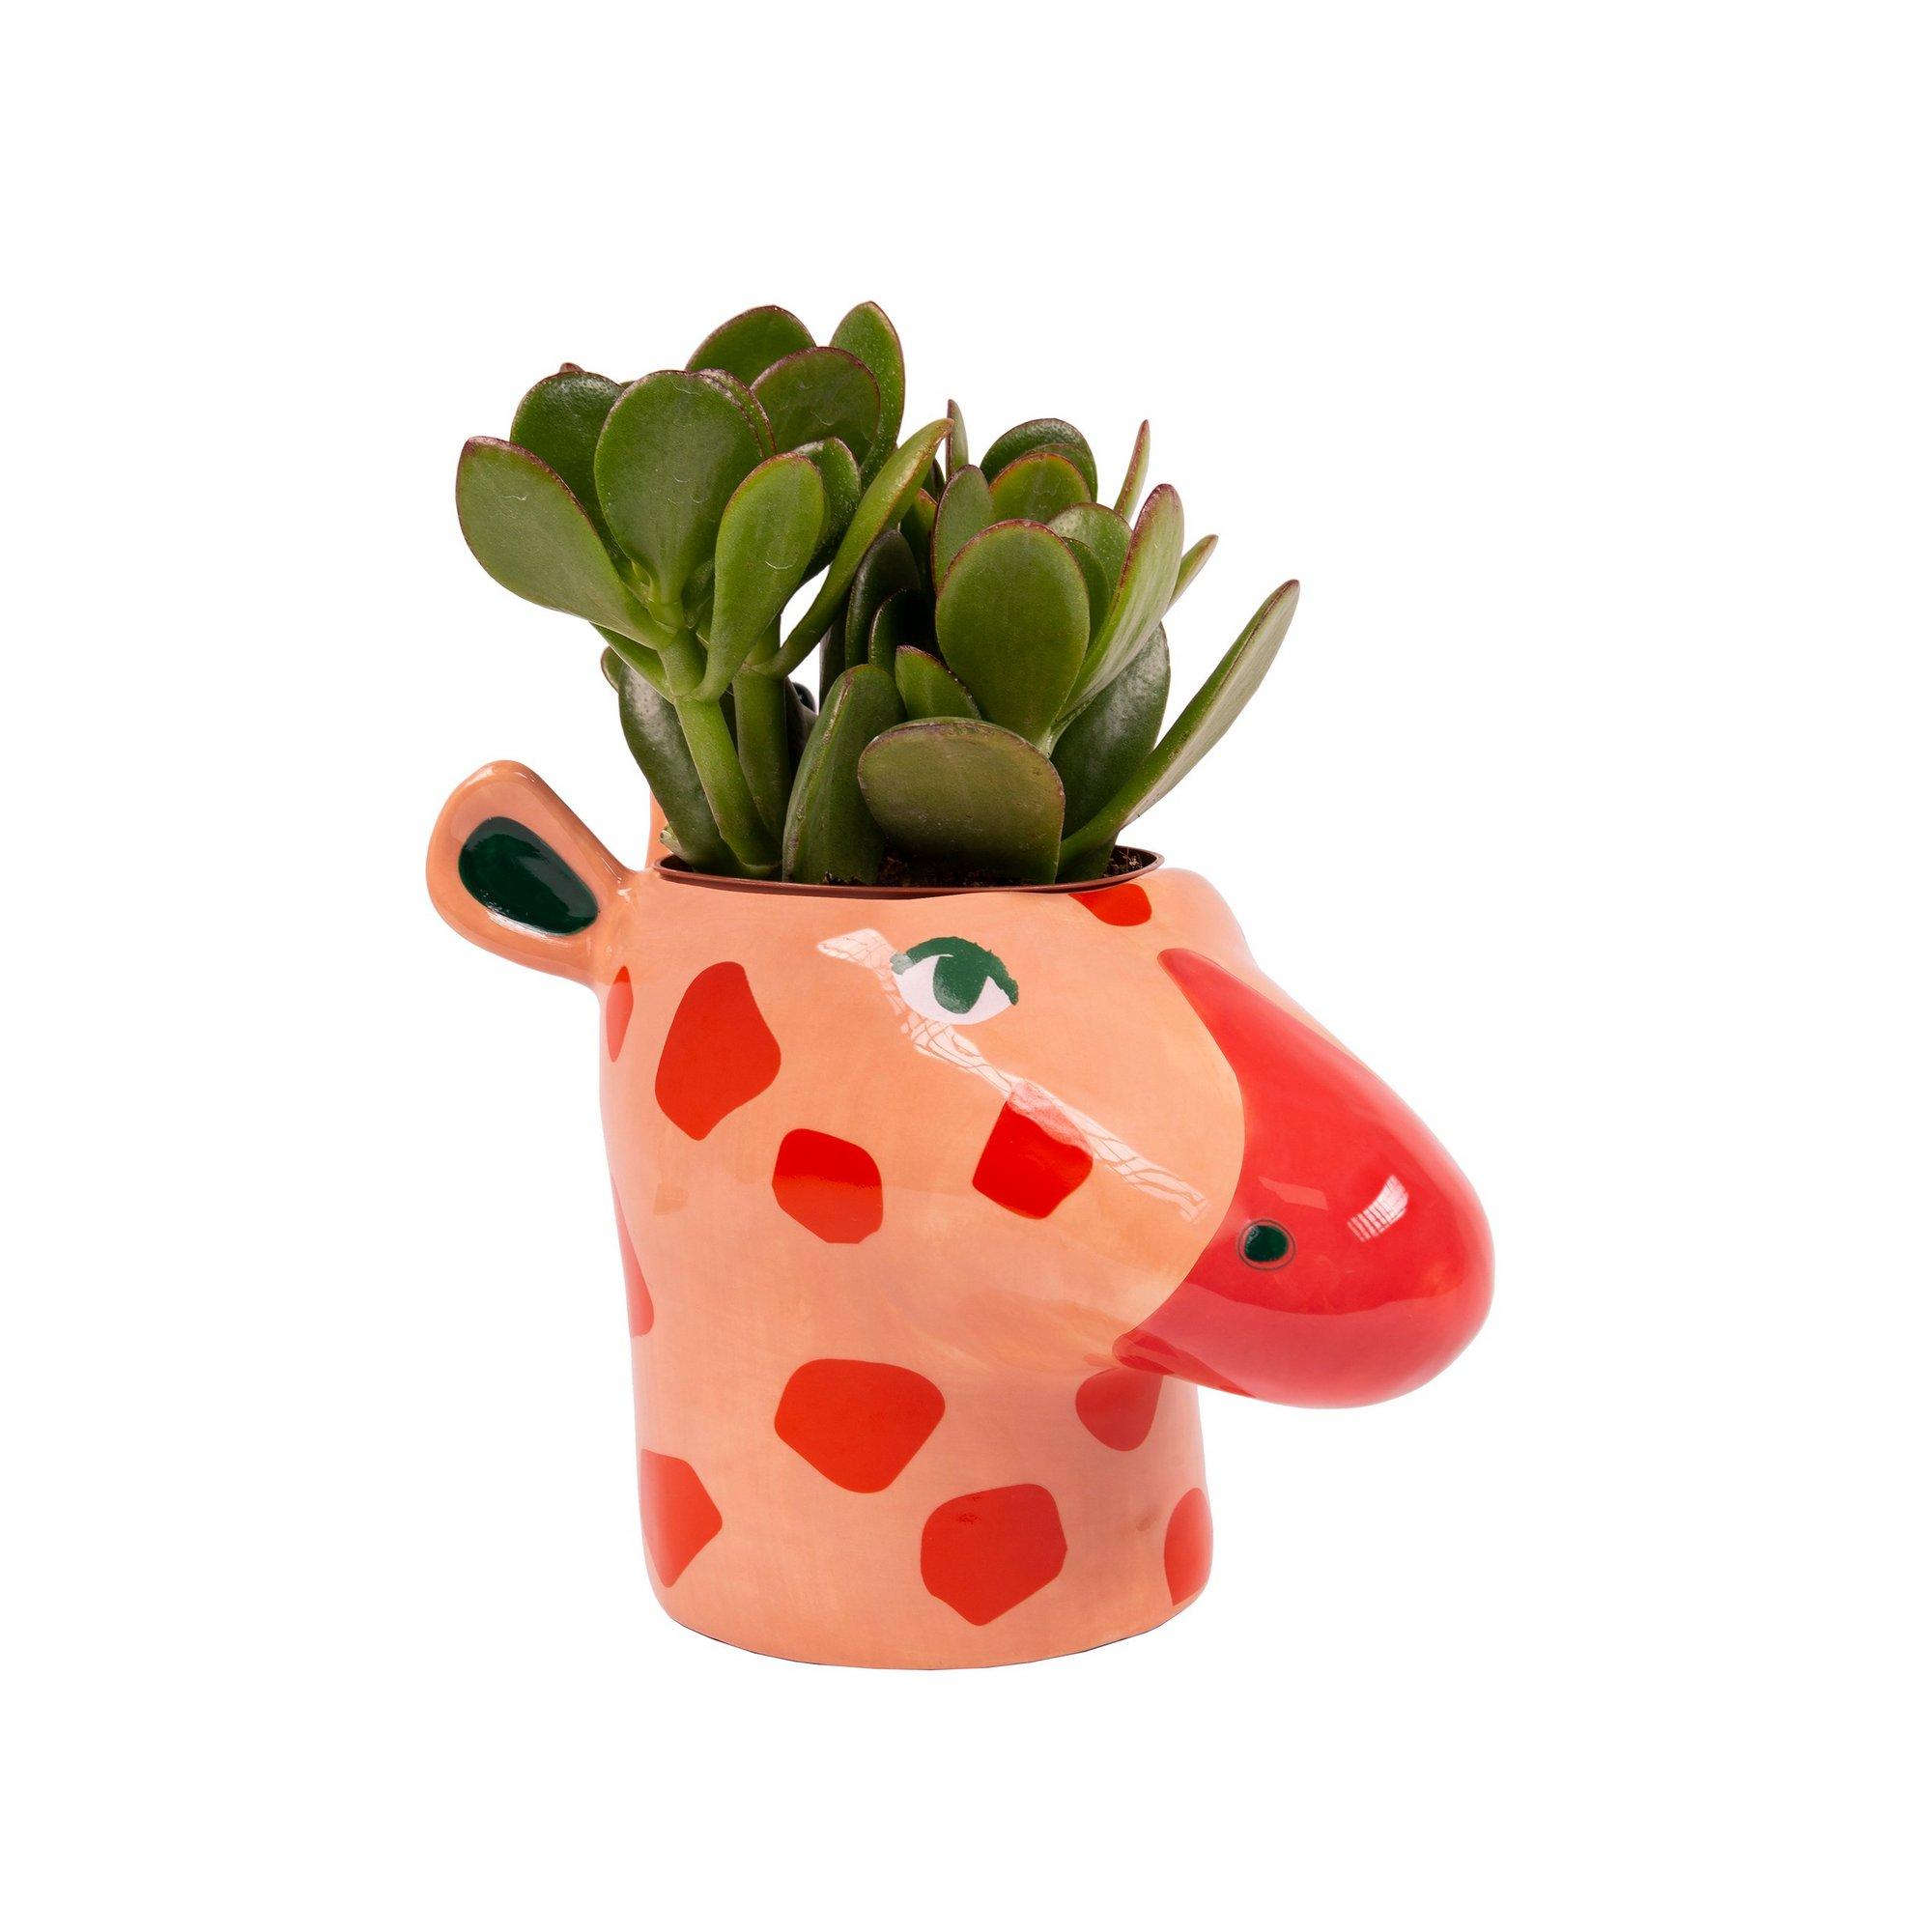 Image of Giraffe Plant Pot